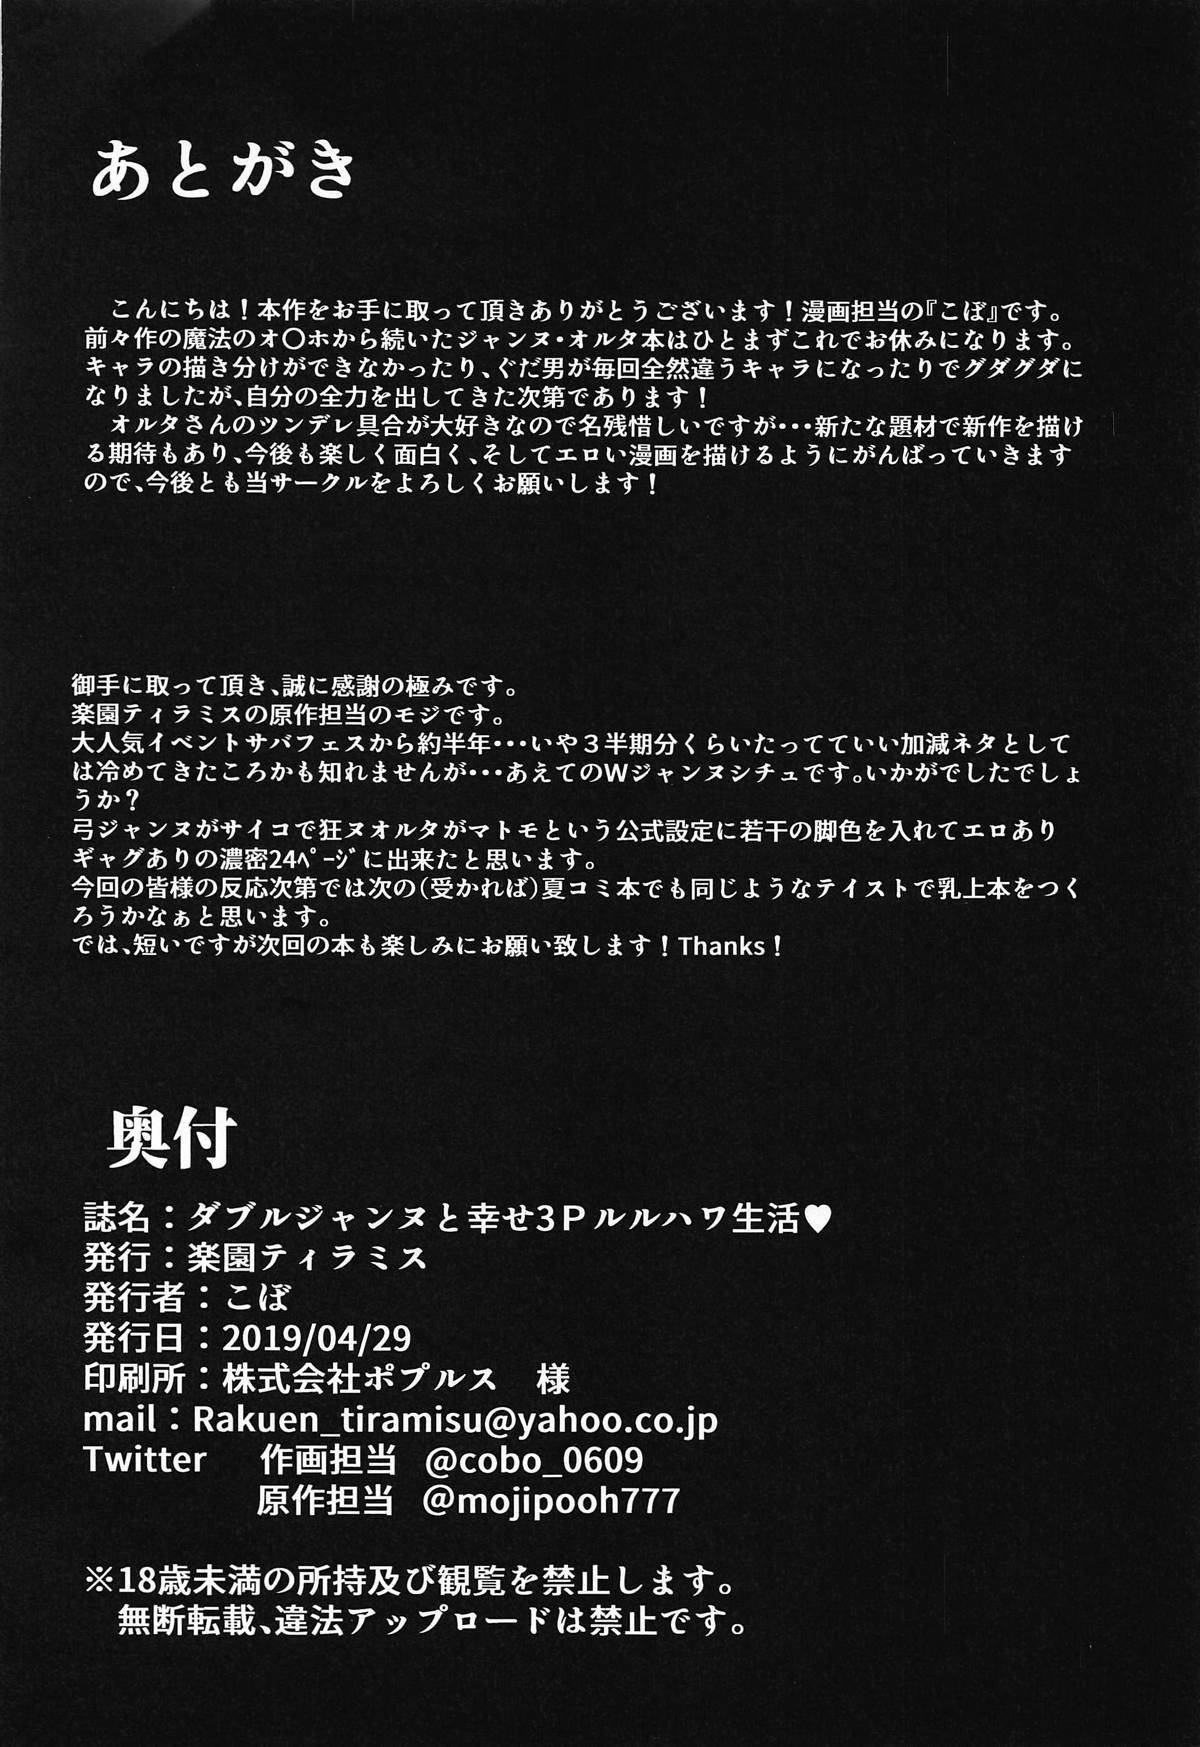 Double Jeanne to Shiawase 3P Luluhawa Seikatsu 24